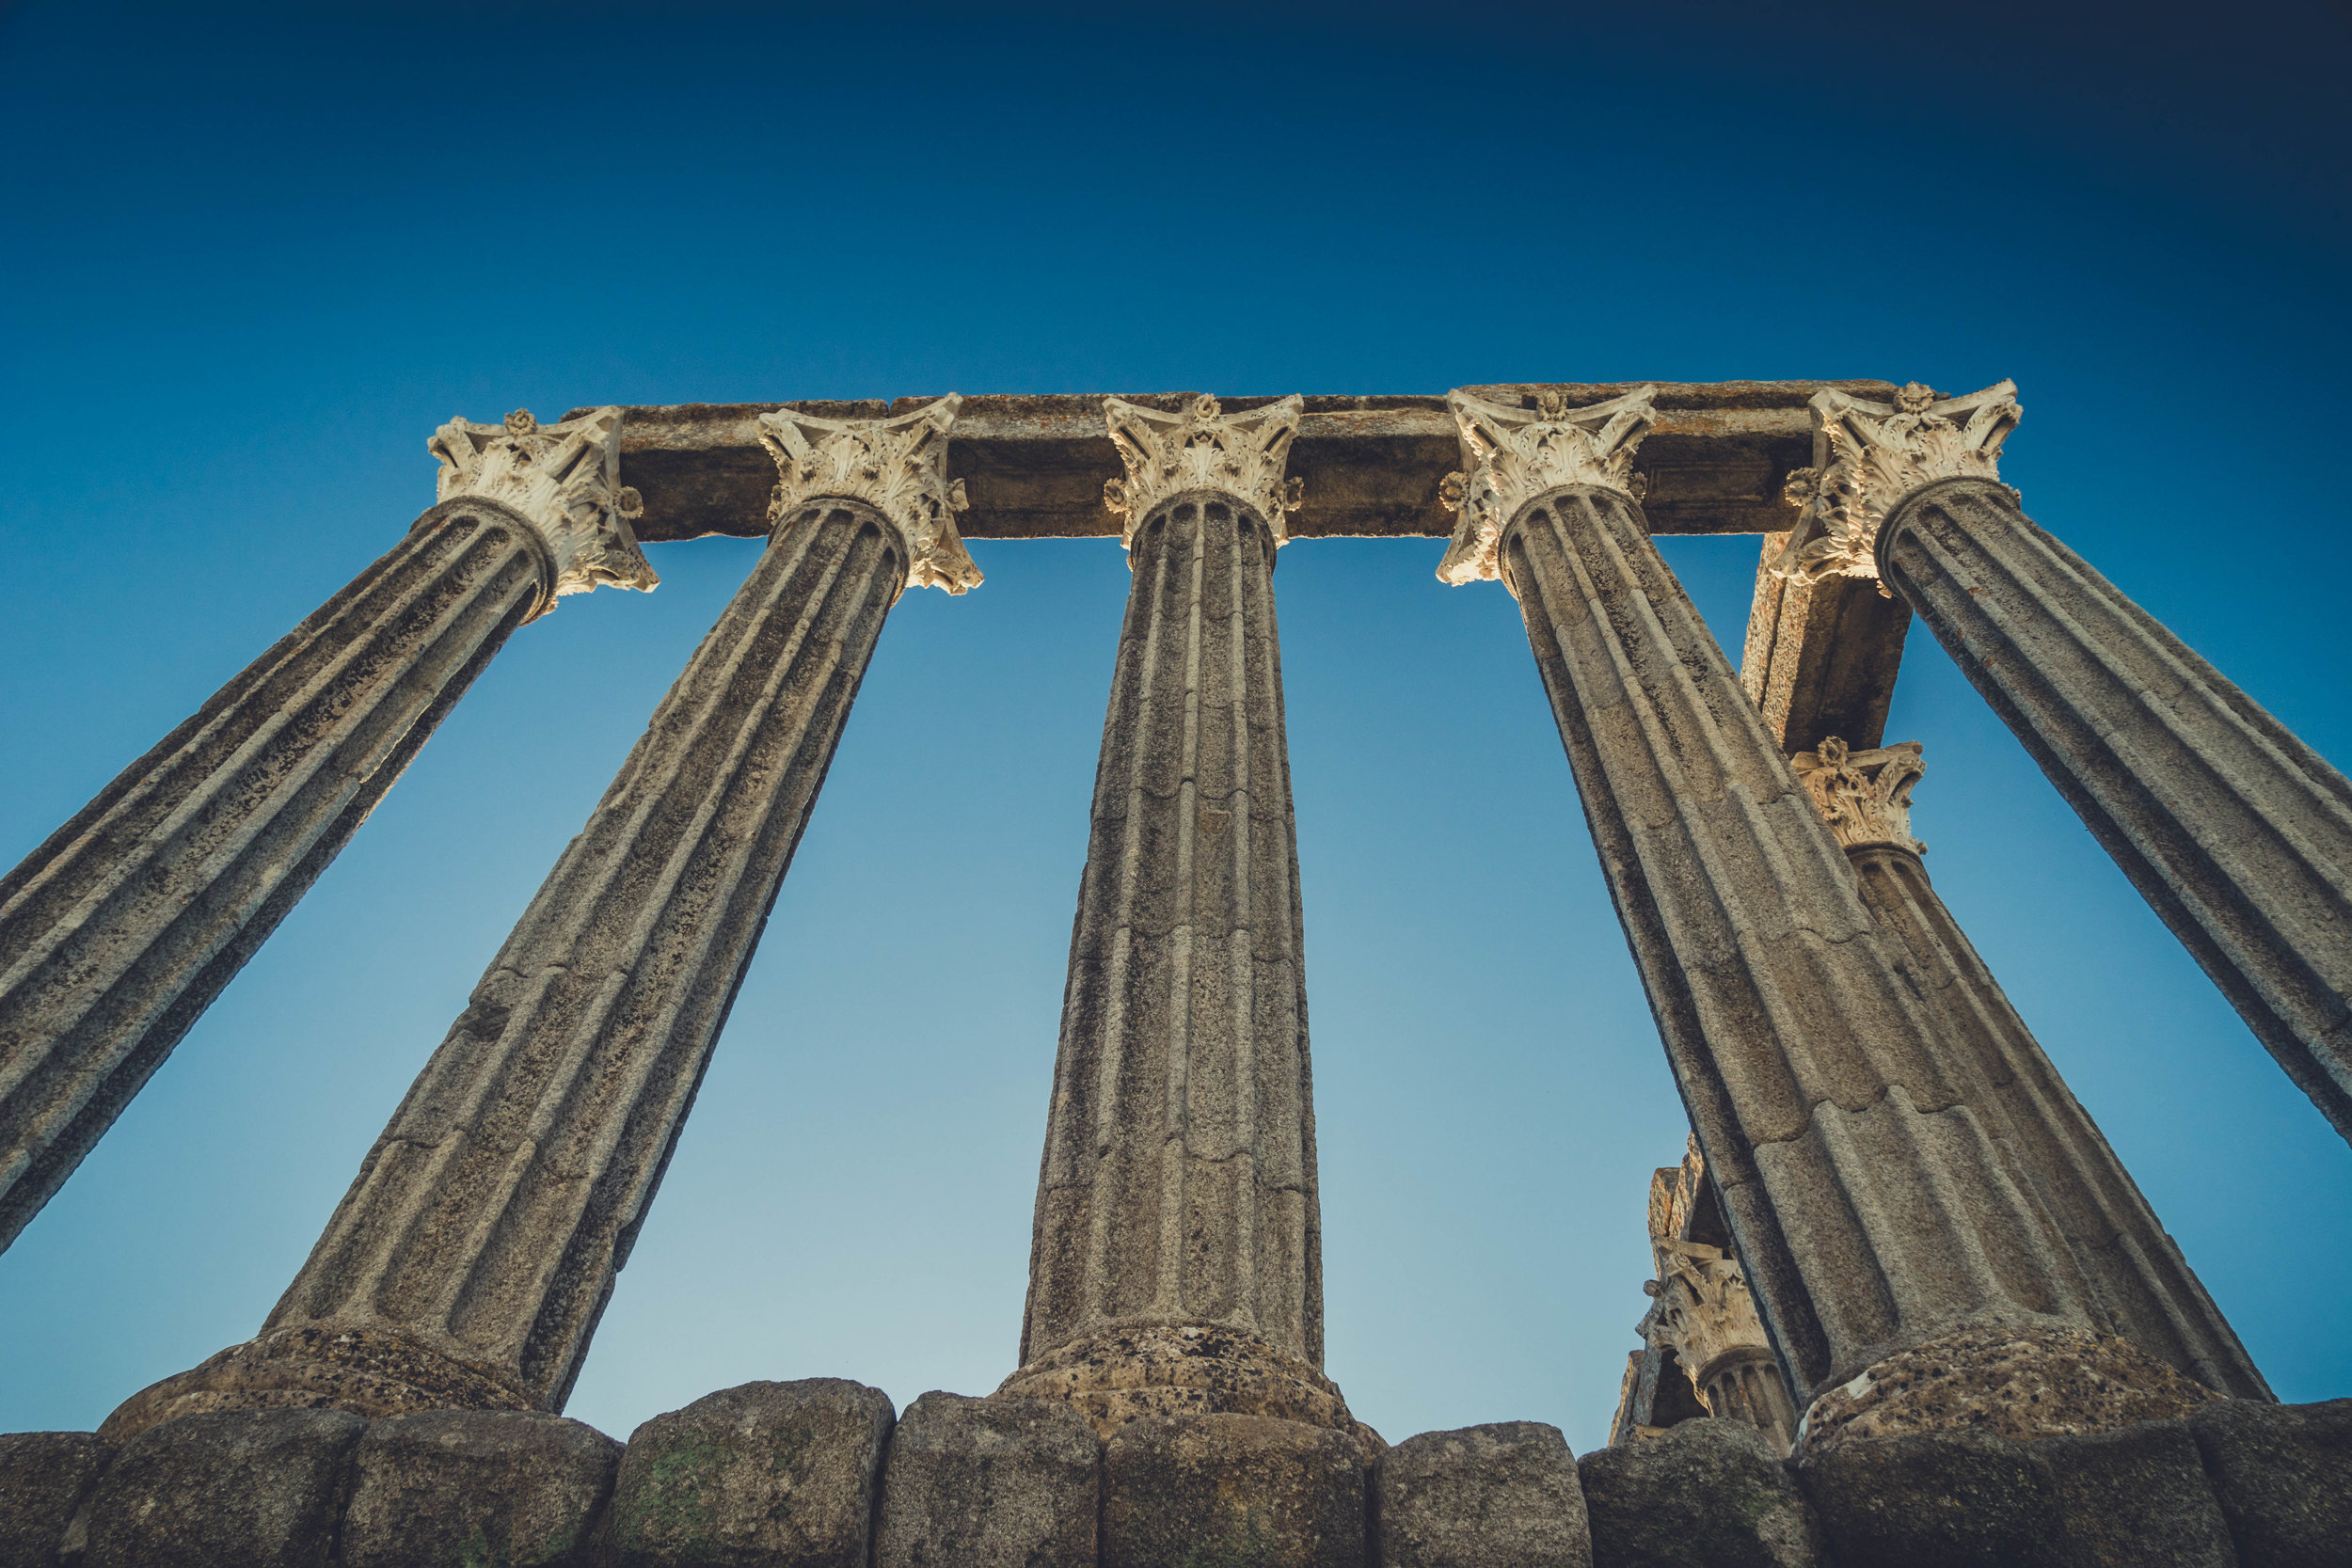 Evora. Roman Ruins. Portugal. Alentejo. Piliers. Roman city. ancient roman town. Blue sky. travel. adventure. history. historical. wine. architecture.jpg